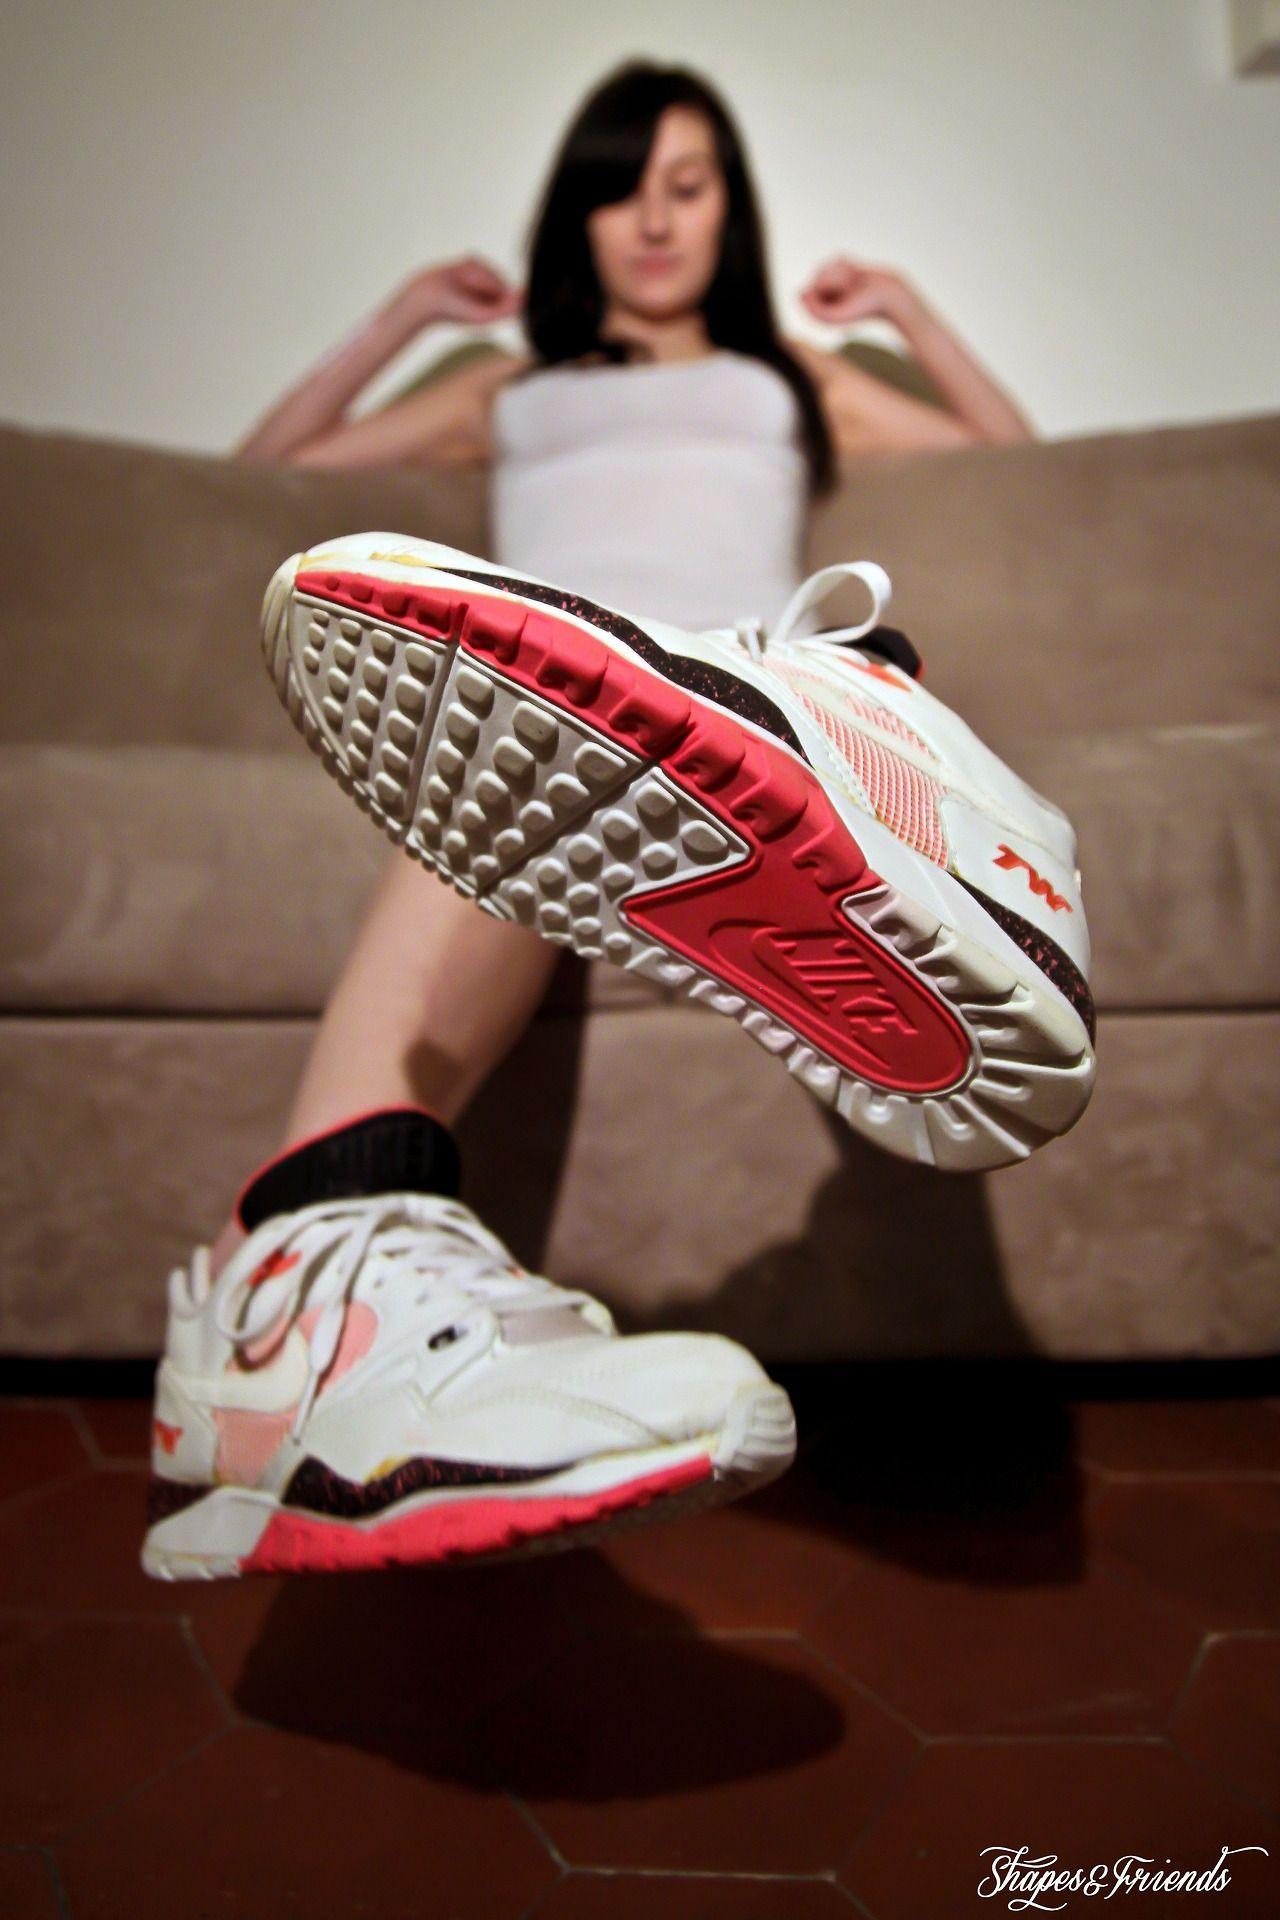 Nike Women Air Trainer TW Lite Shapes